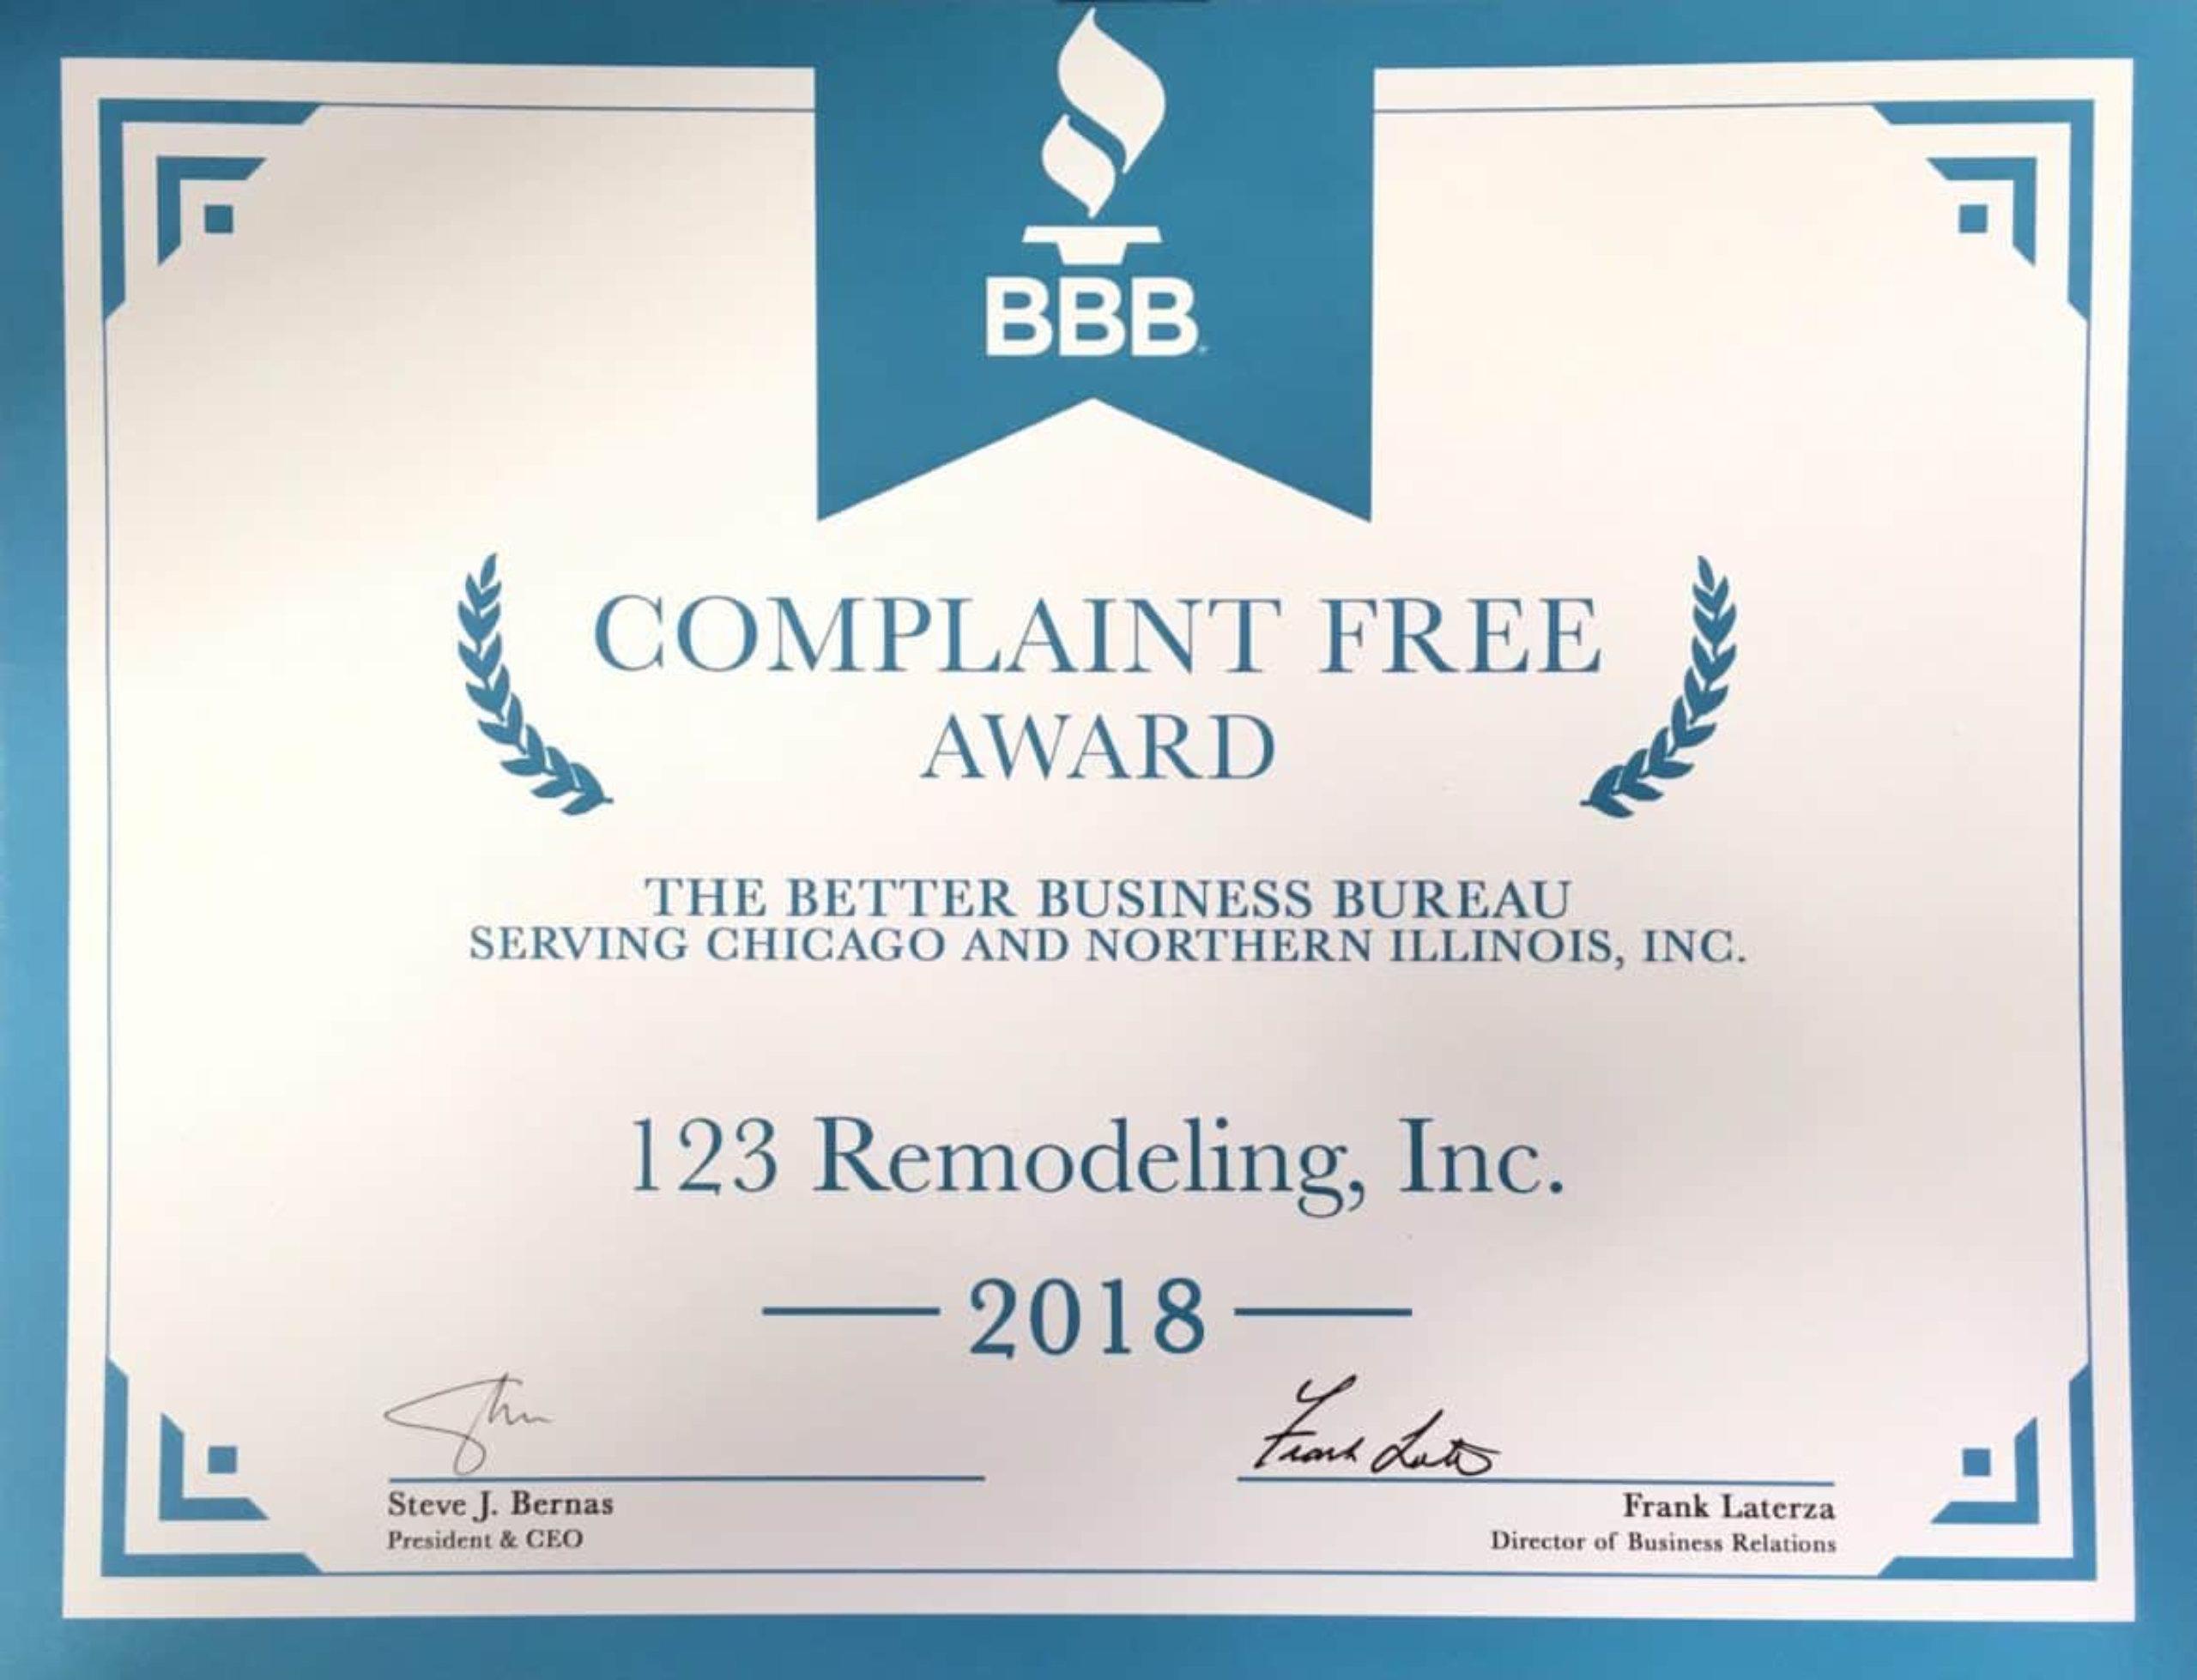 123 Remodeling Complaint Free Award 2018